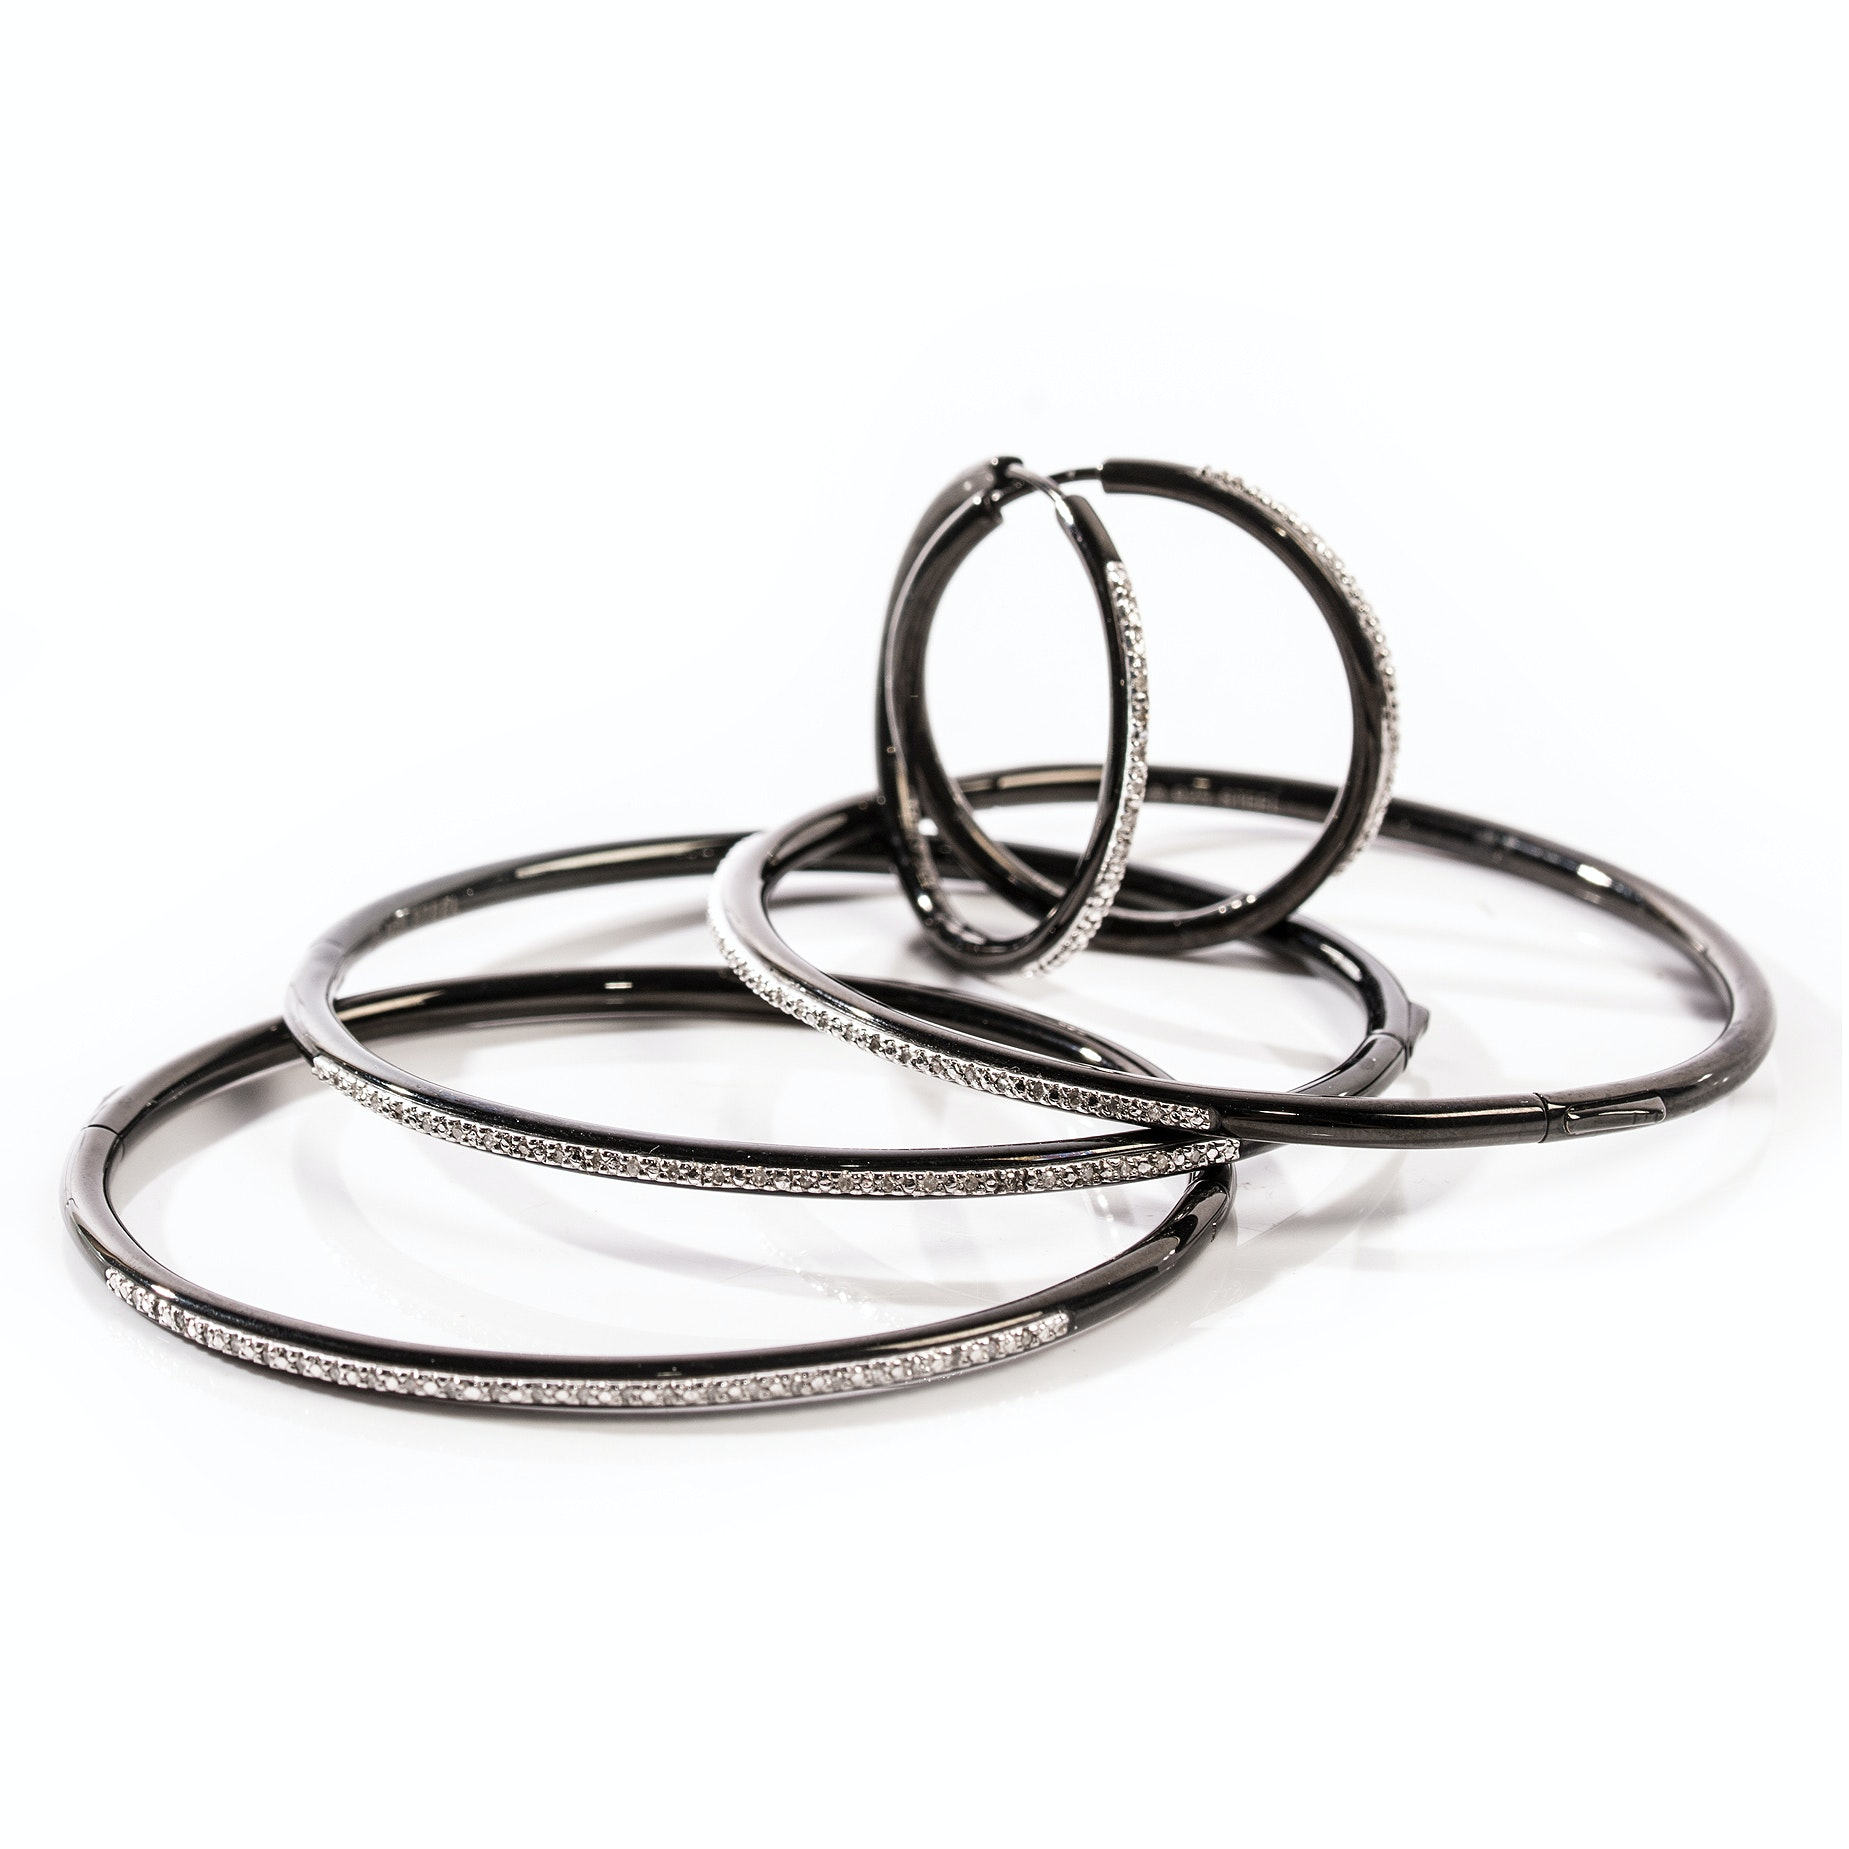 Blackened Sterling Silver Steel Diamond Hoop Earrings and Bangle Bracelets